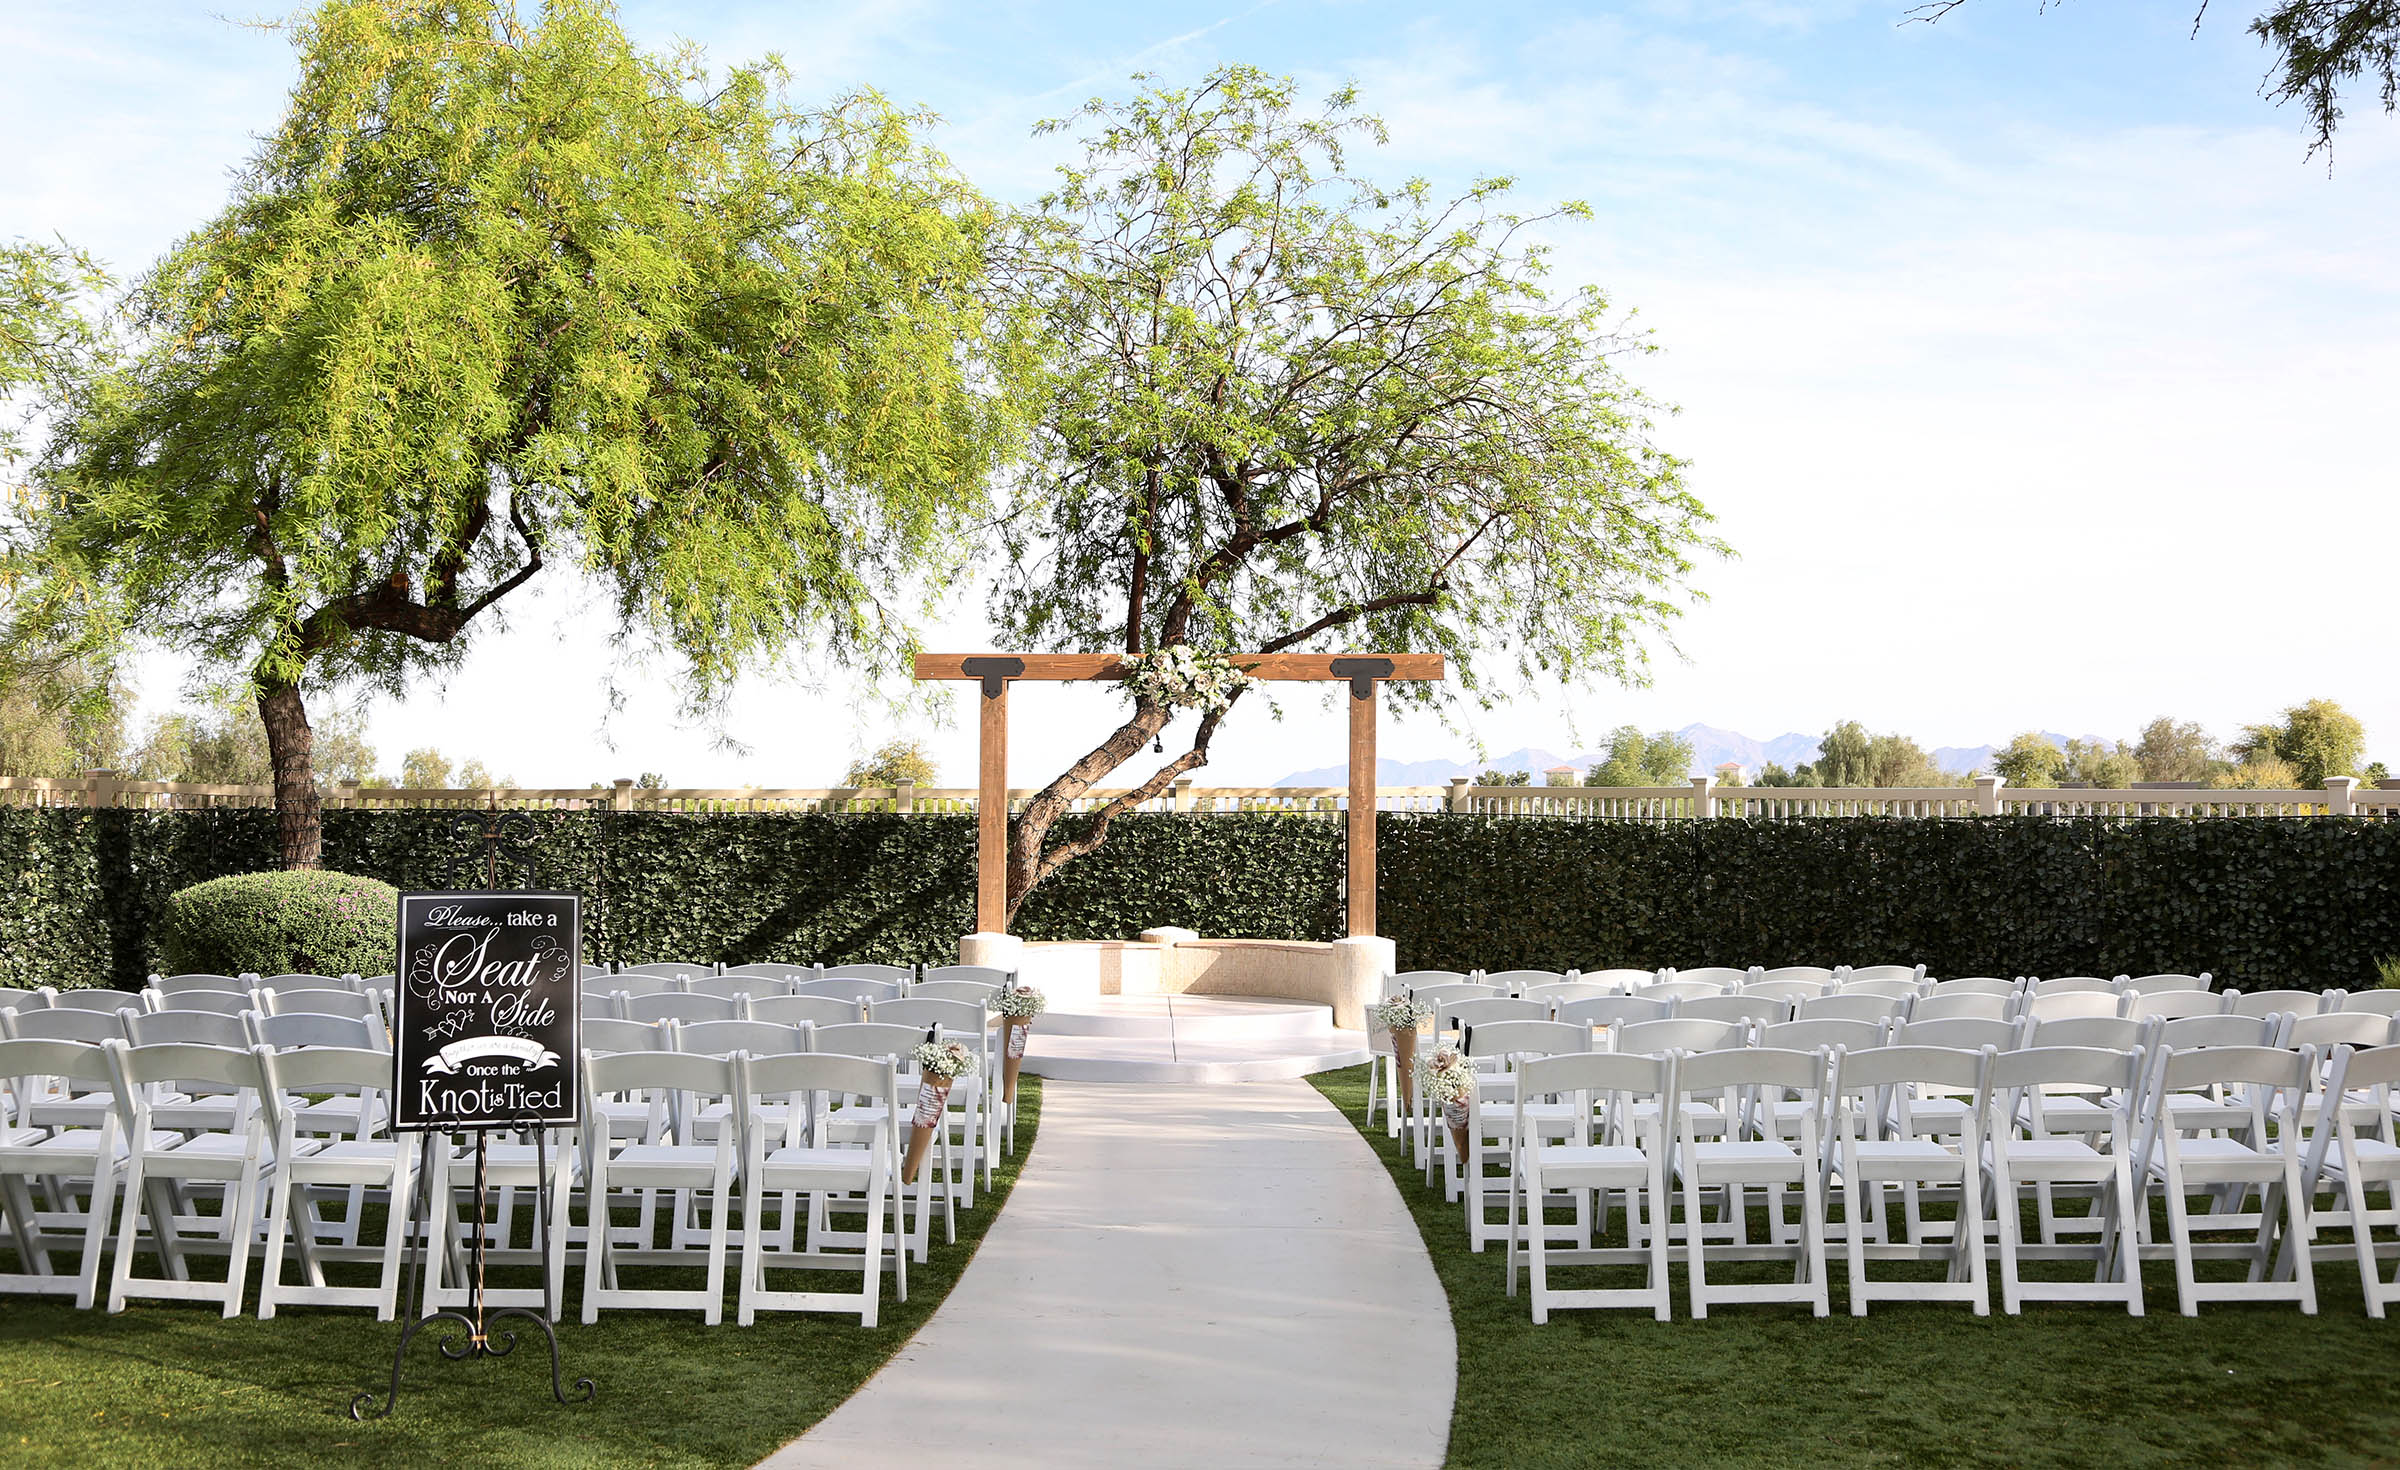 Beautifully ceremony site - Palm Valley - Goodyear, Arizona - Maricopa County - Wedgewood Weddings